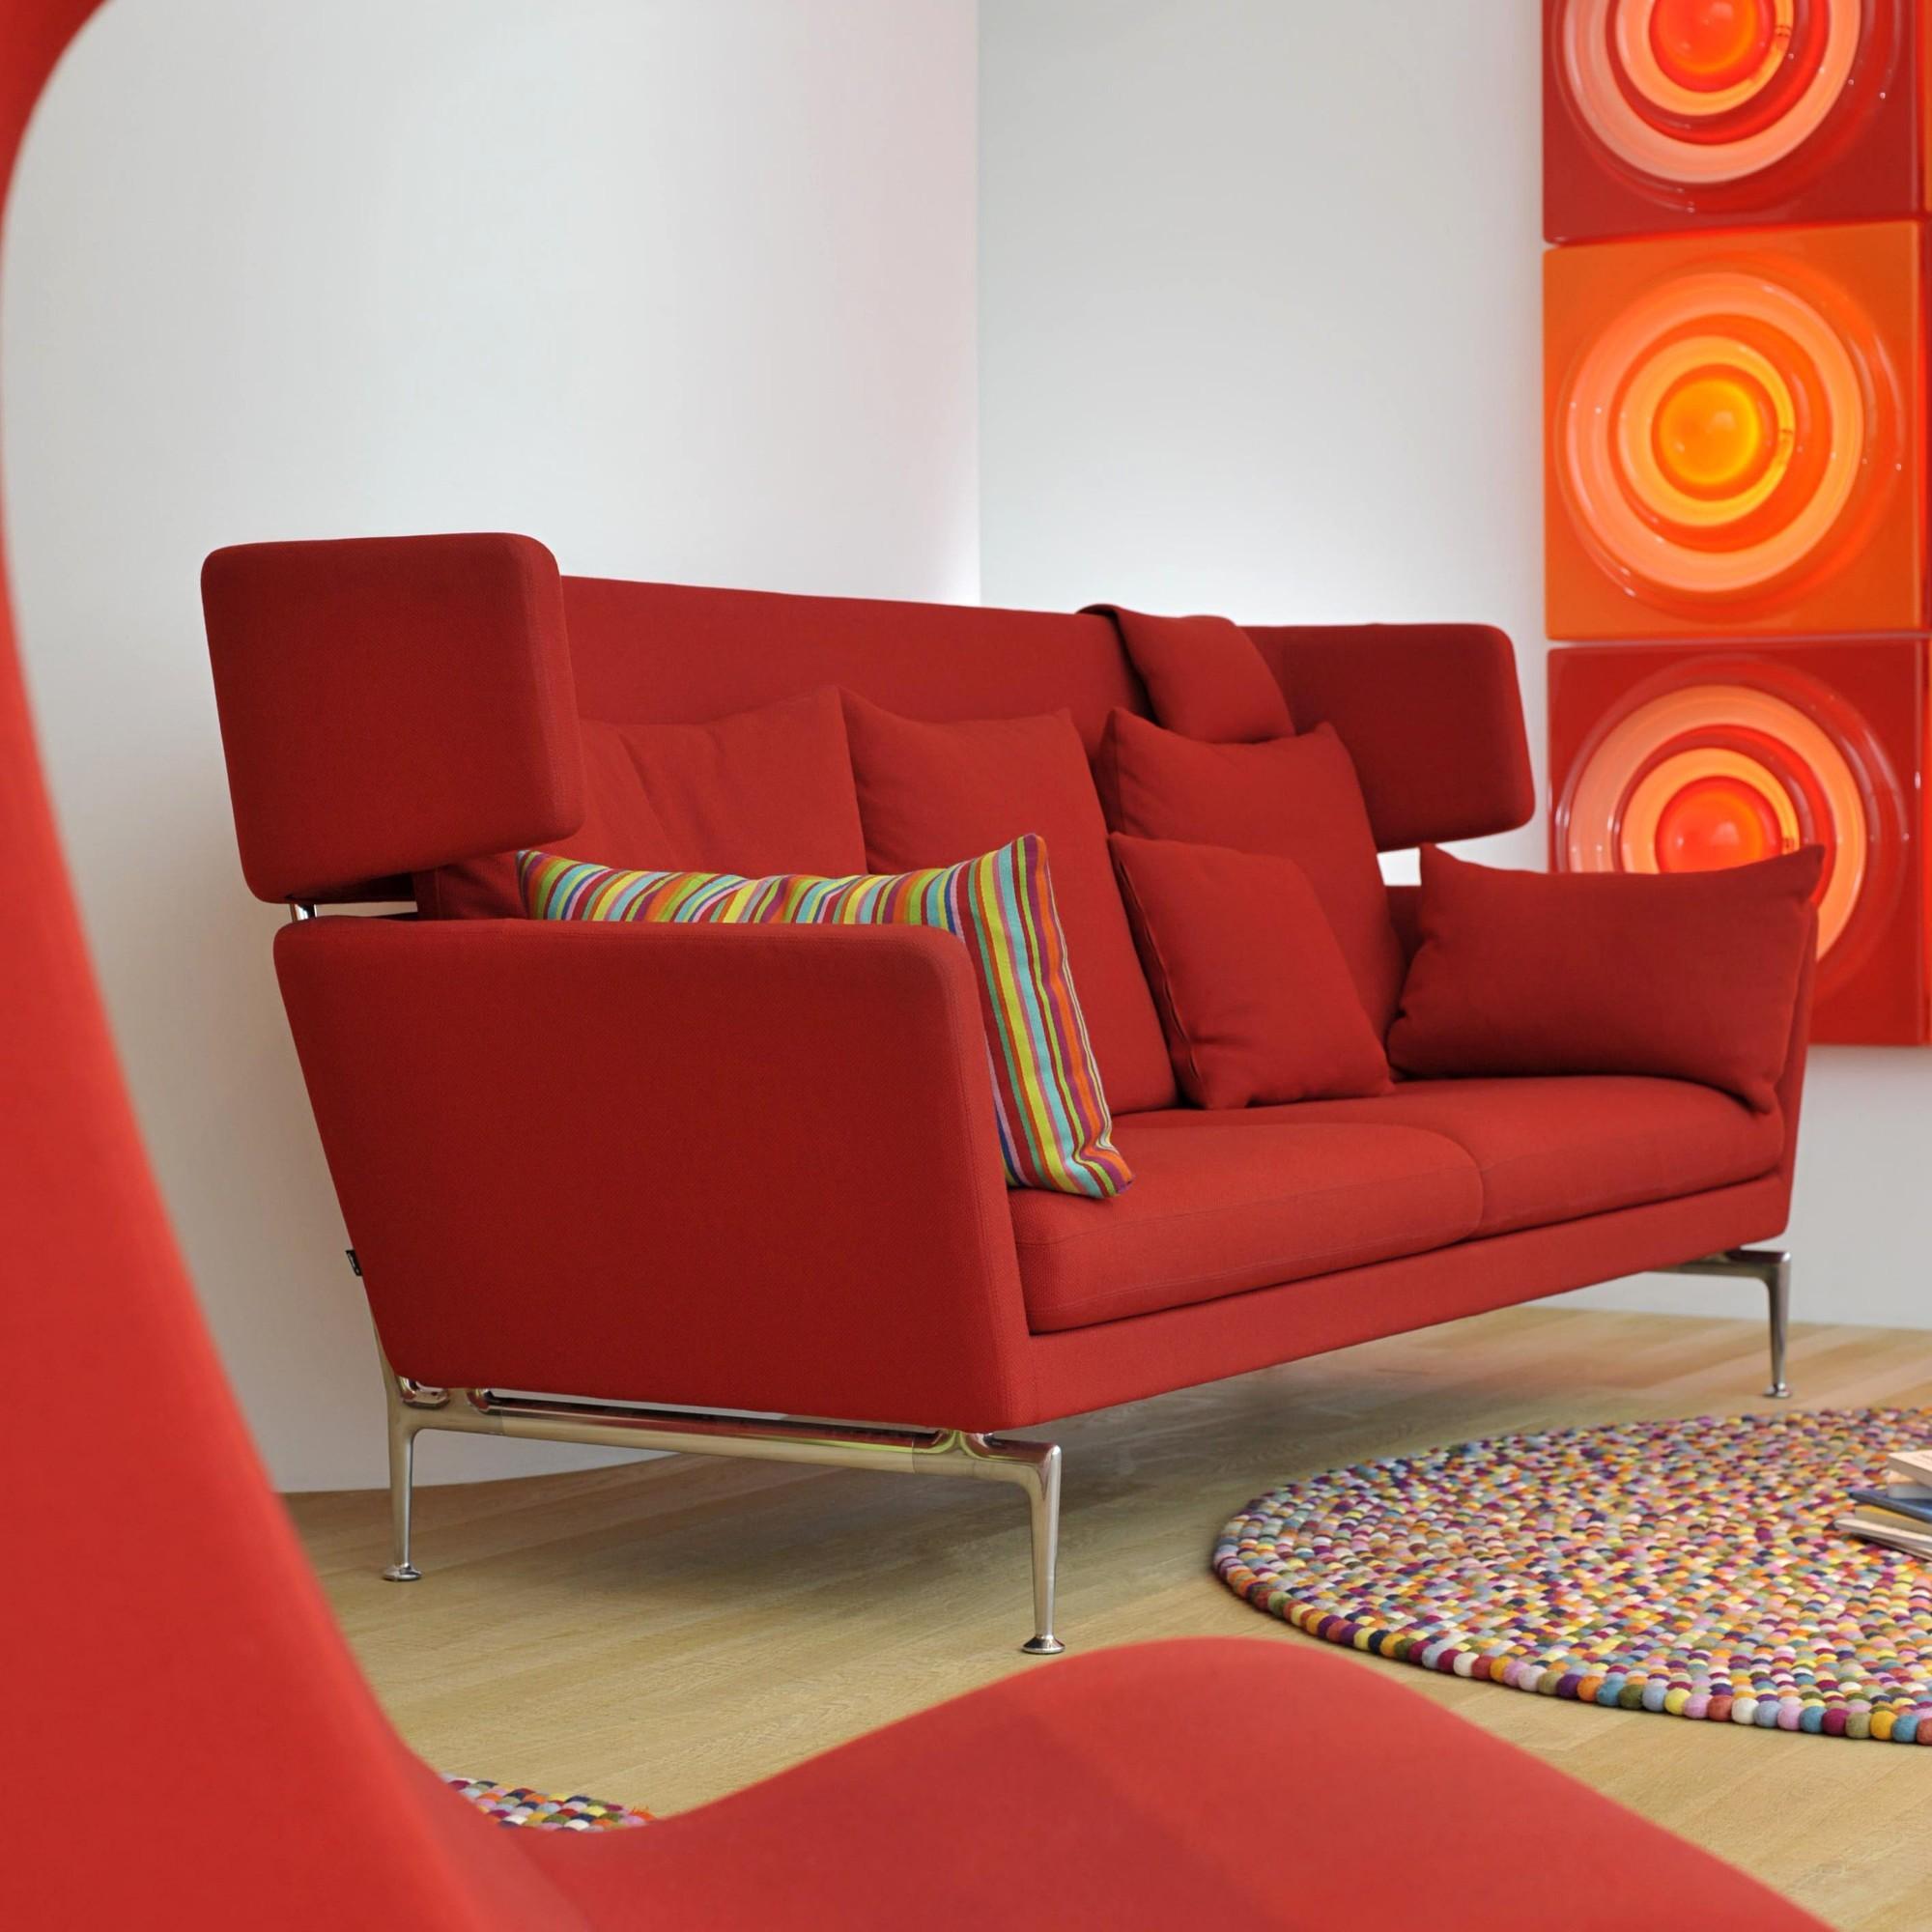 vitra suita citterio 2 sitzer sofa ambientedirect. Black Bedroom Furniture Sets. Home Design Ideas